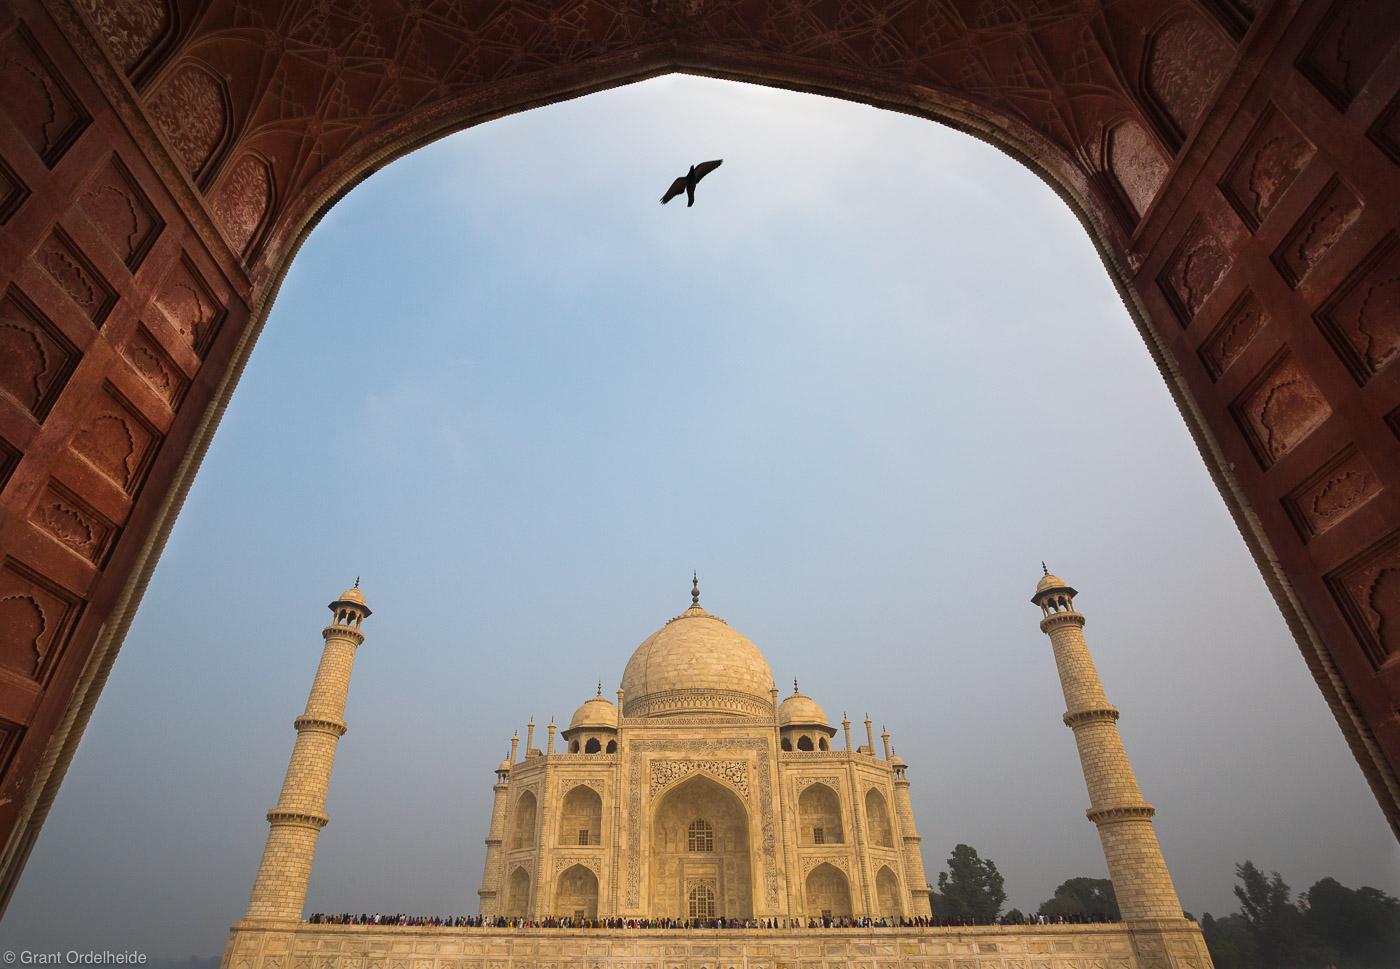 taj, mahal, famous, agra, india, structures, world, mausoleum, emperor, shah, jahan, mughal, architecture, photo